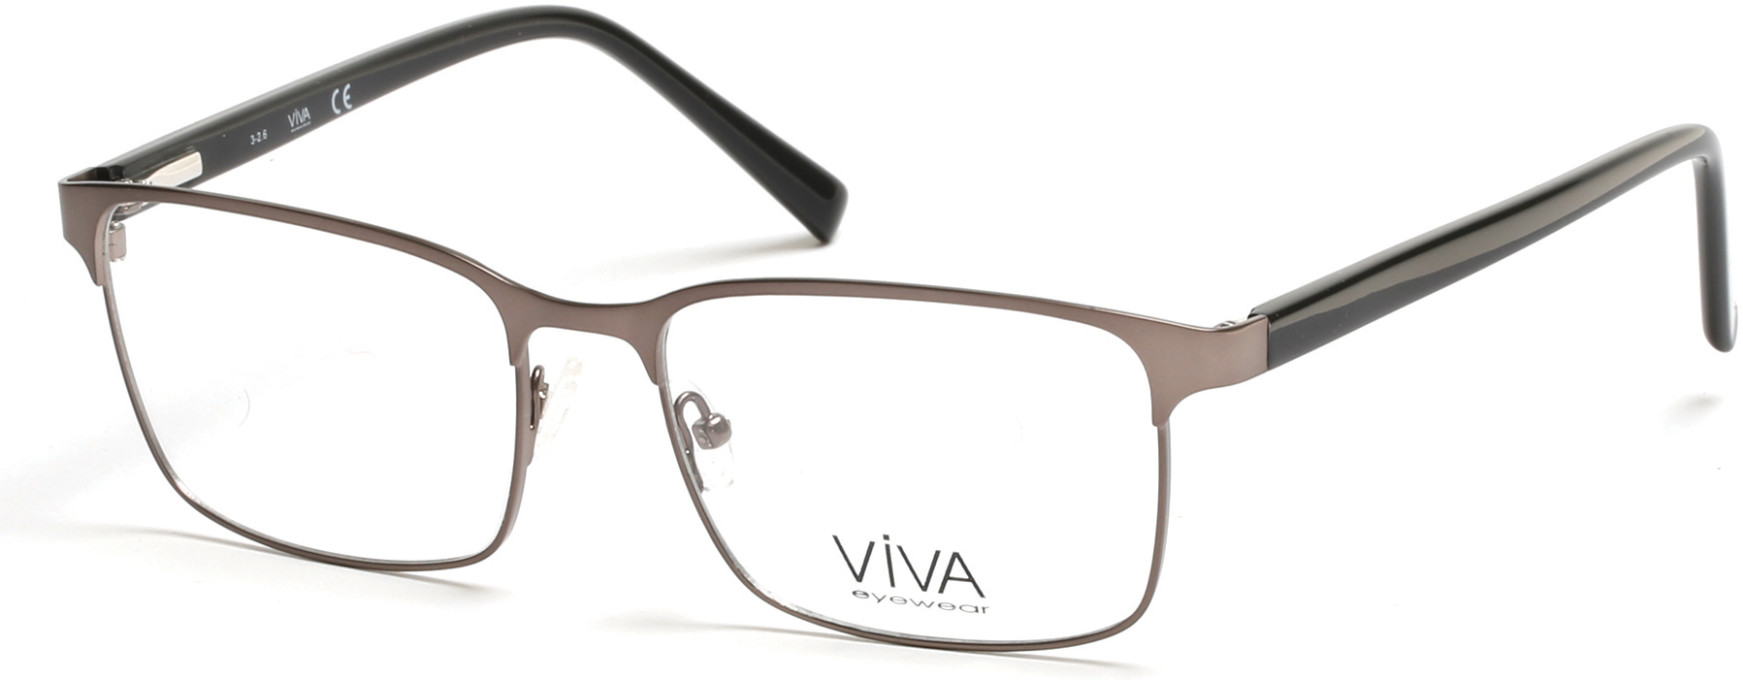 VIVA VV4021 style-color 009 - Matte Gunmetal